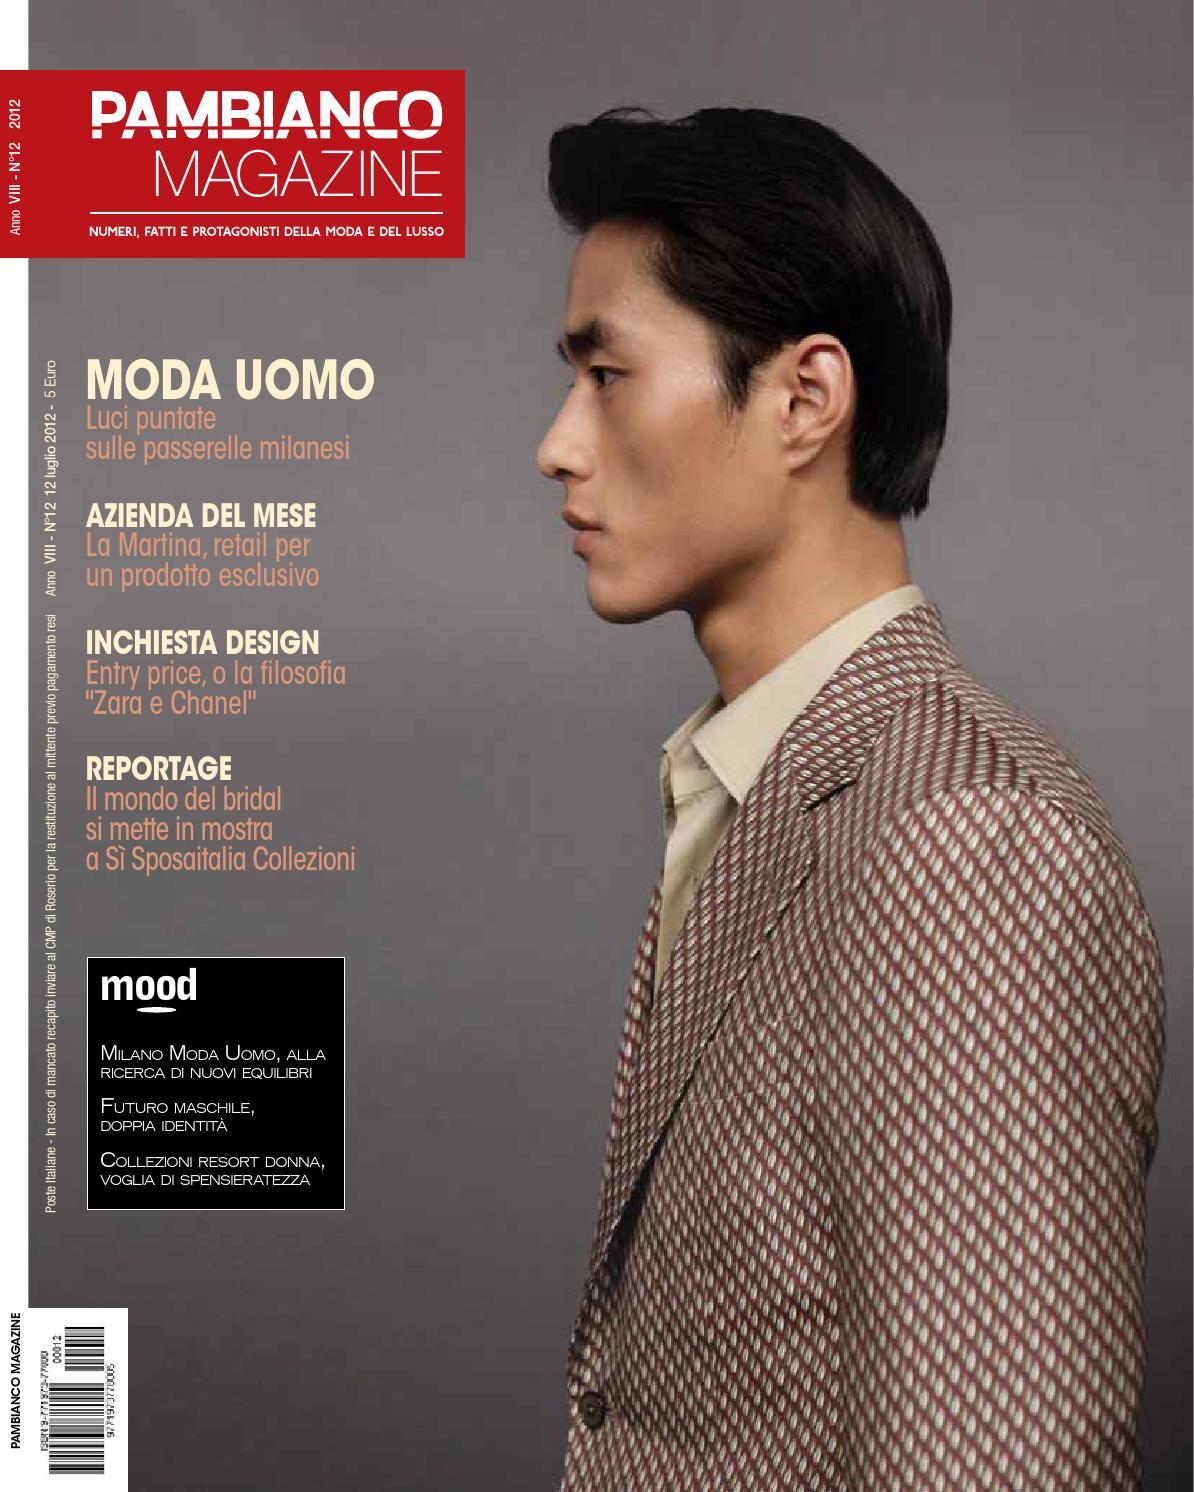 Pambianco magazine N.12 NIII by Pambianconews - issuu f58d5a5a25b1